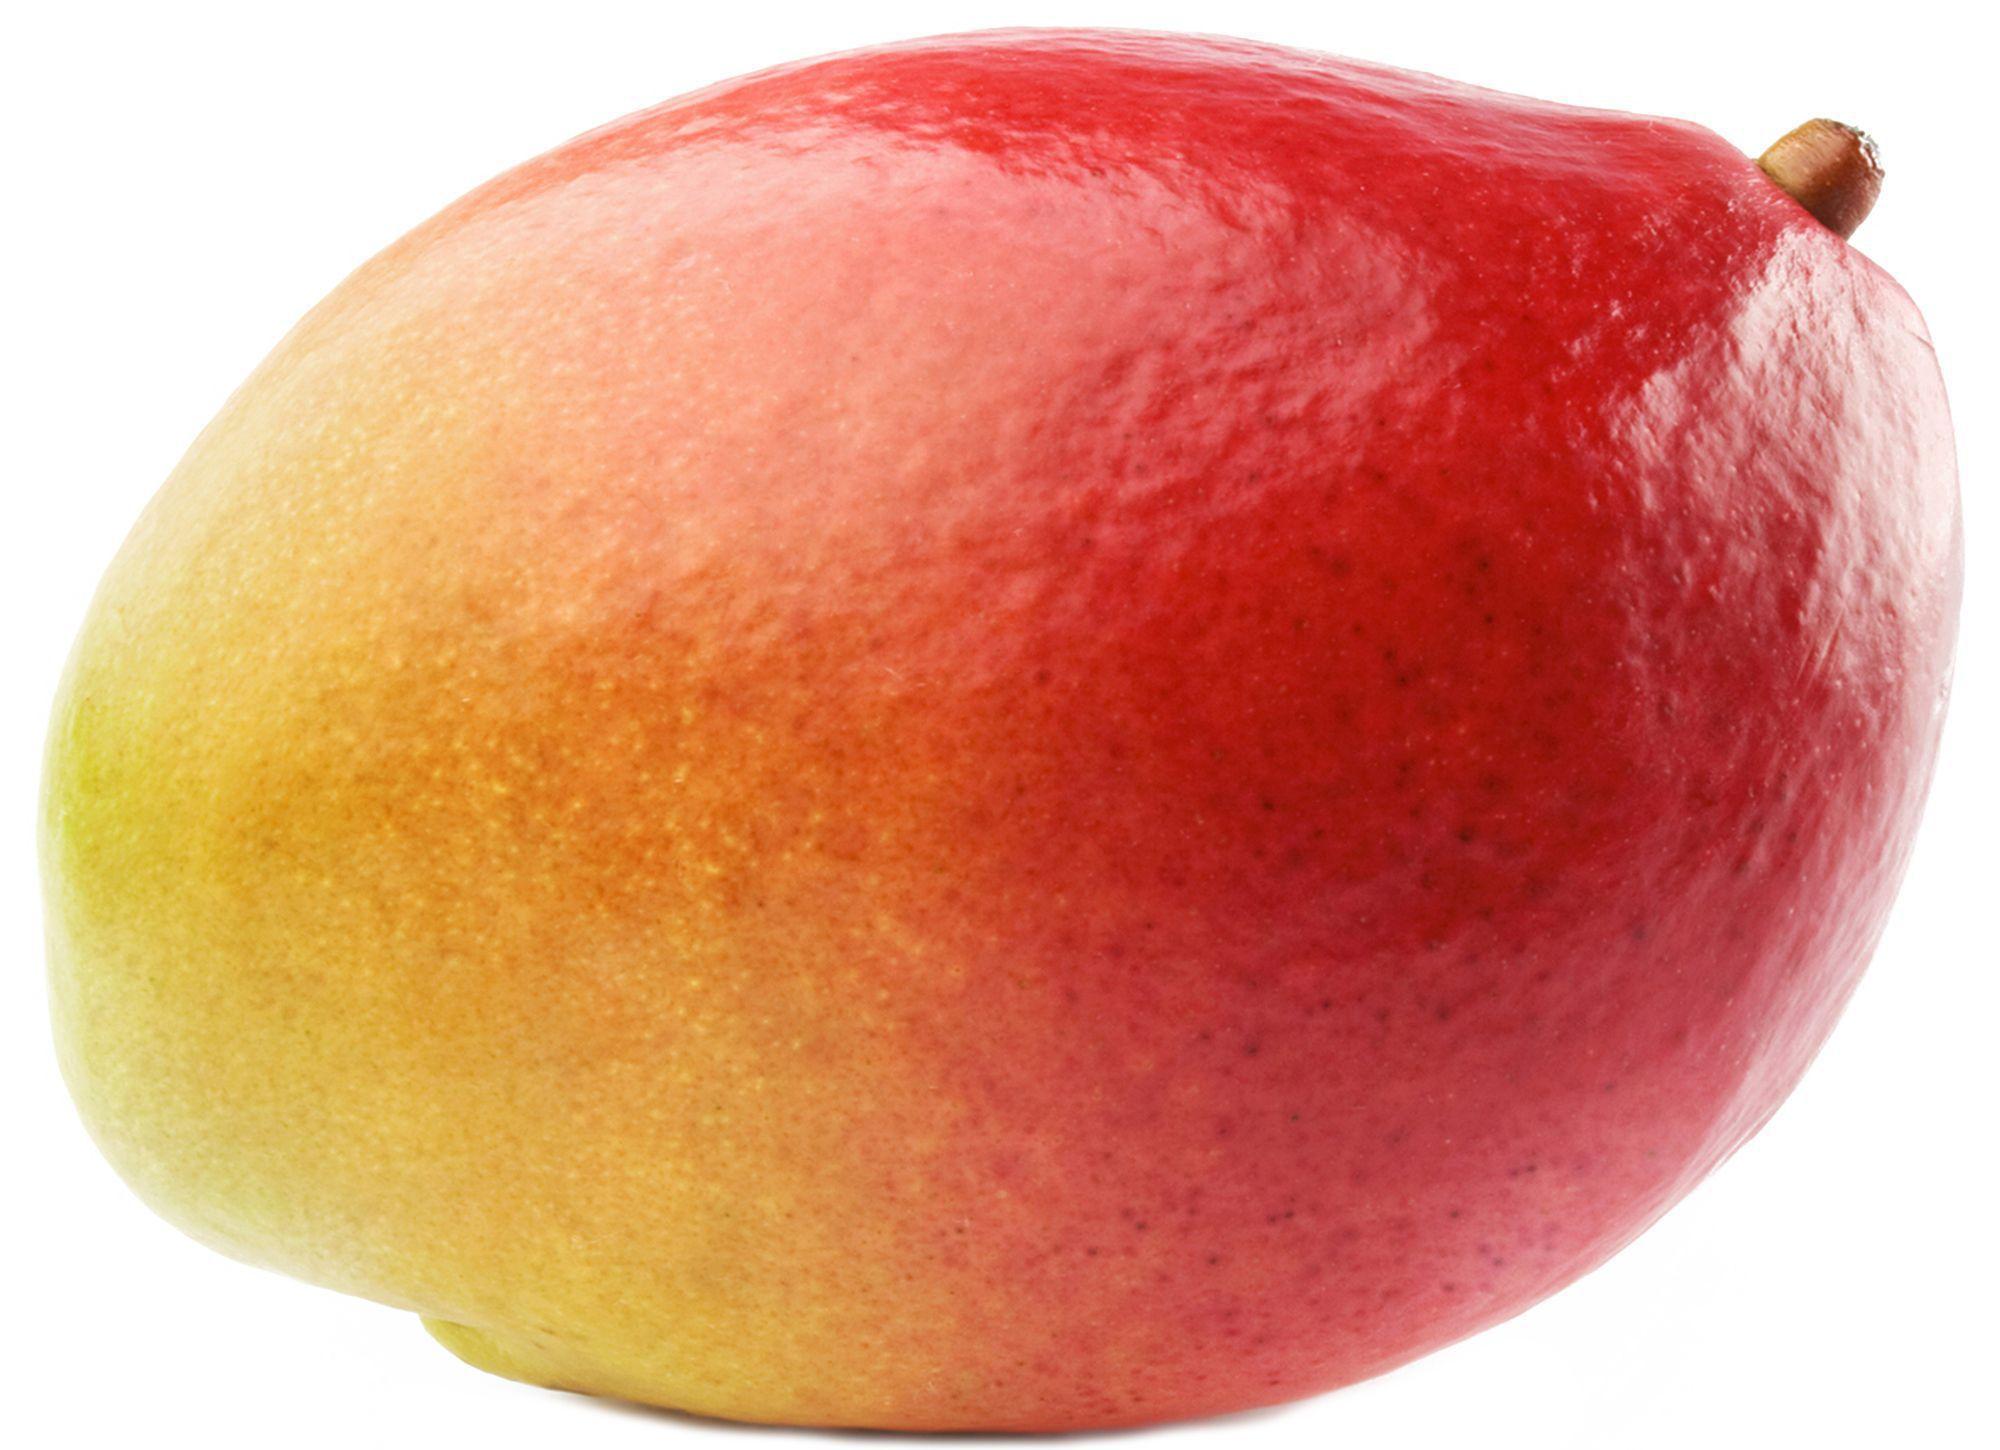 Mango Hd Desktop